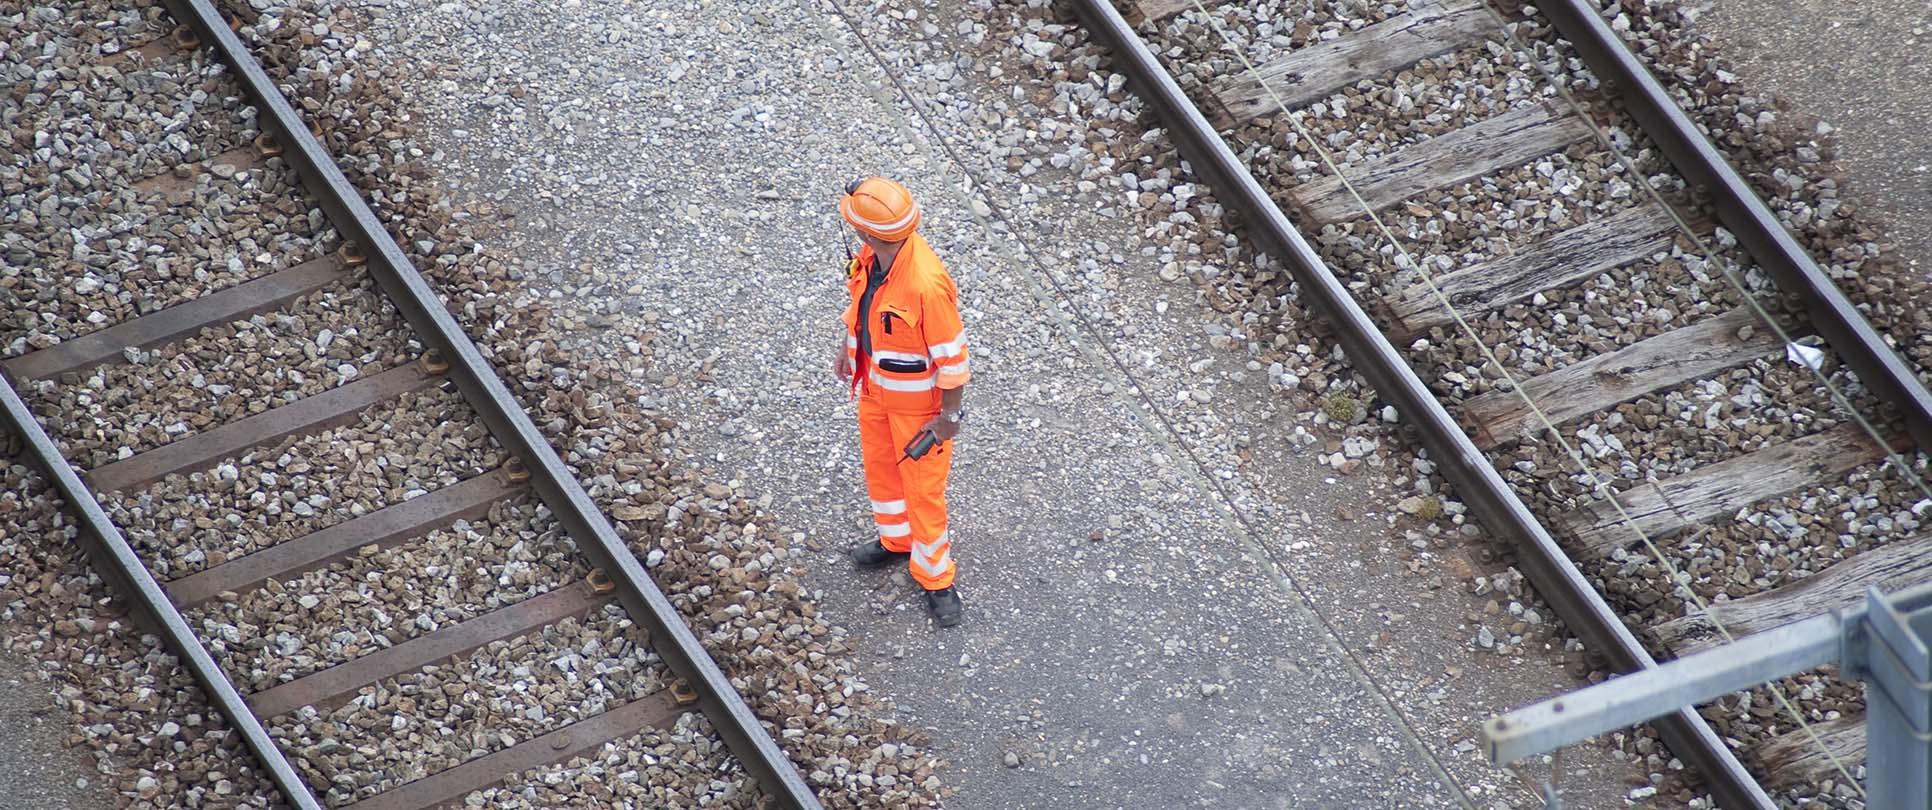 International Railway Safety